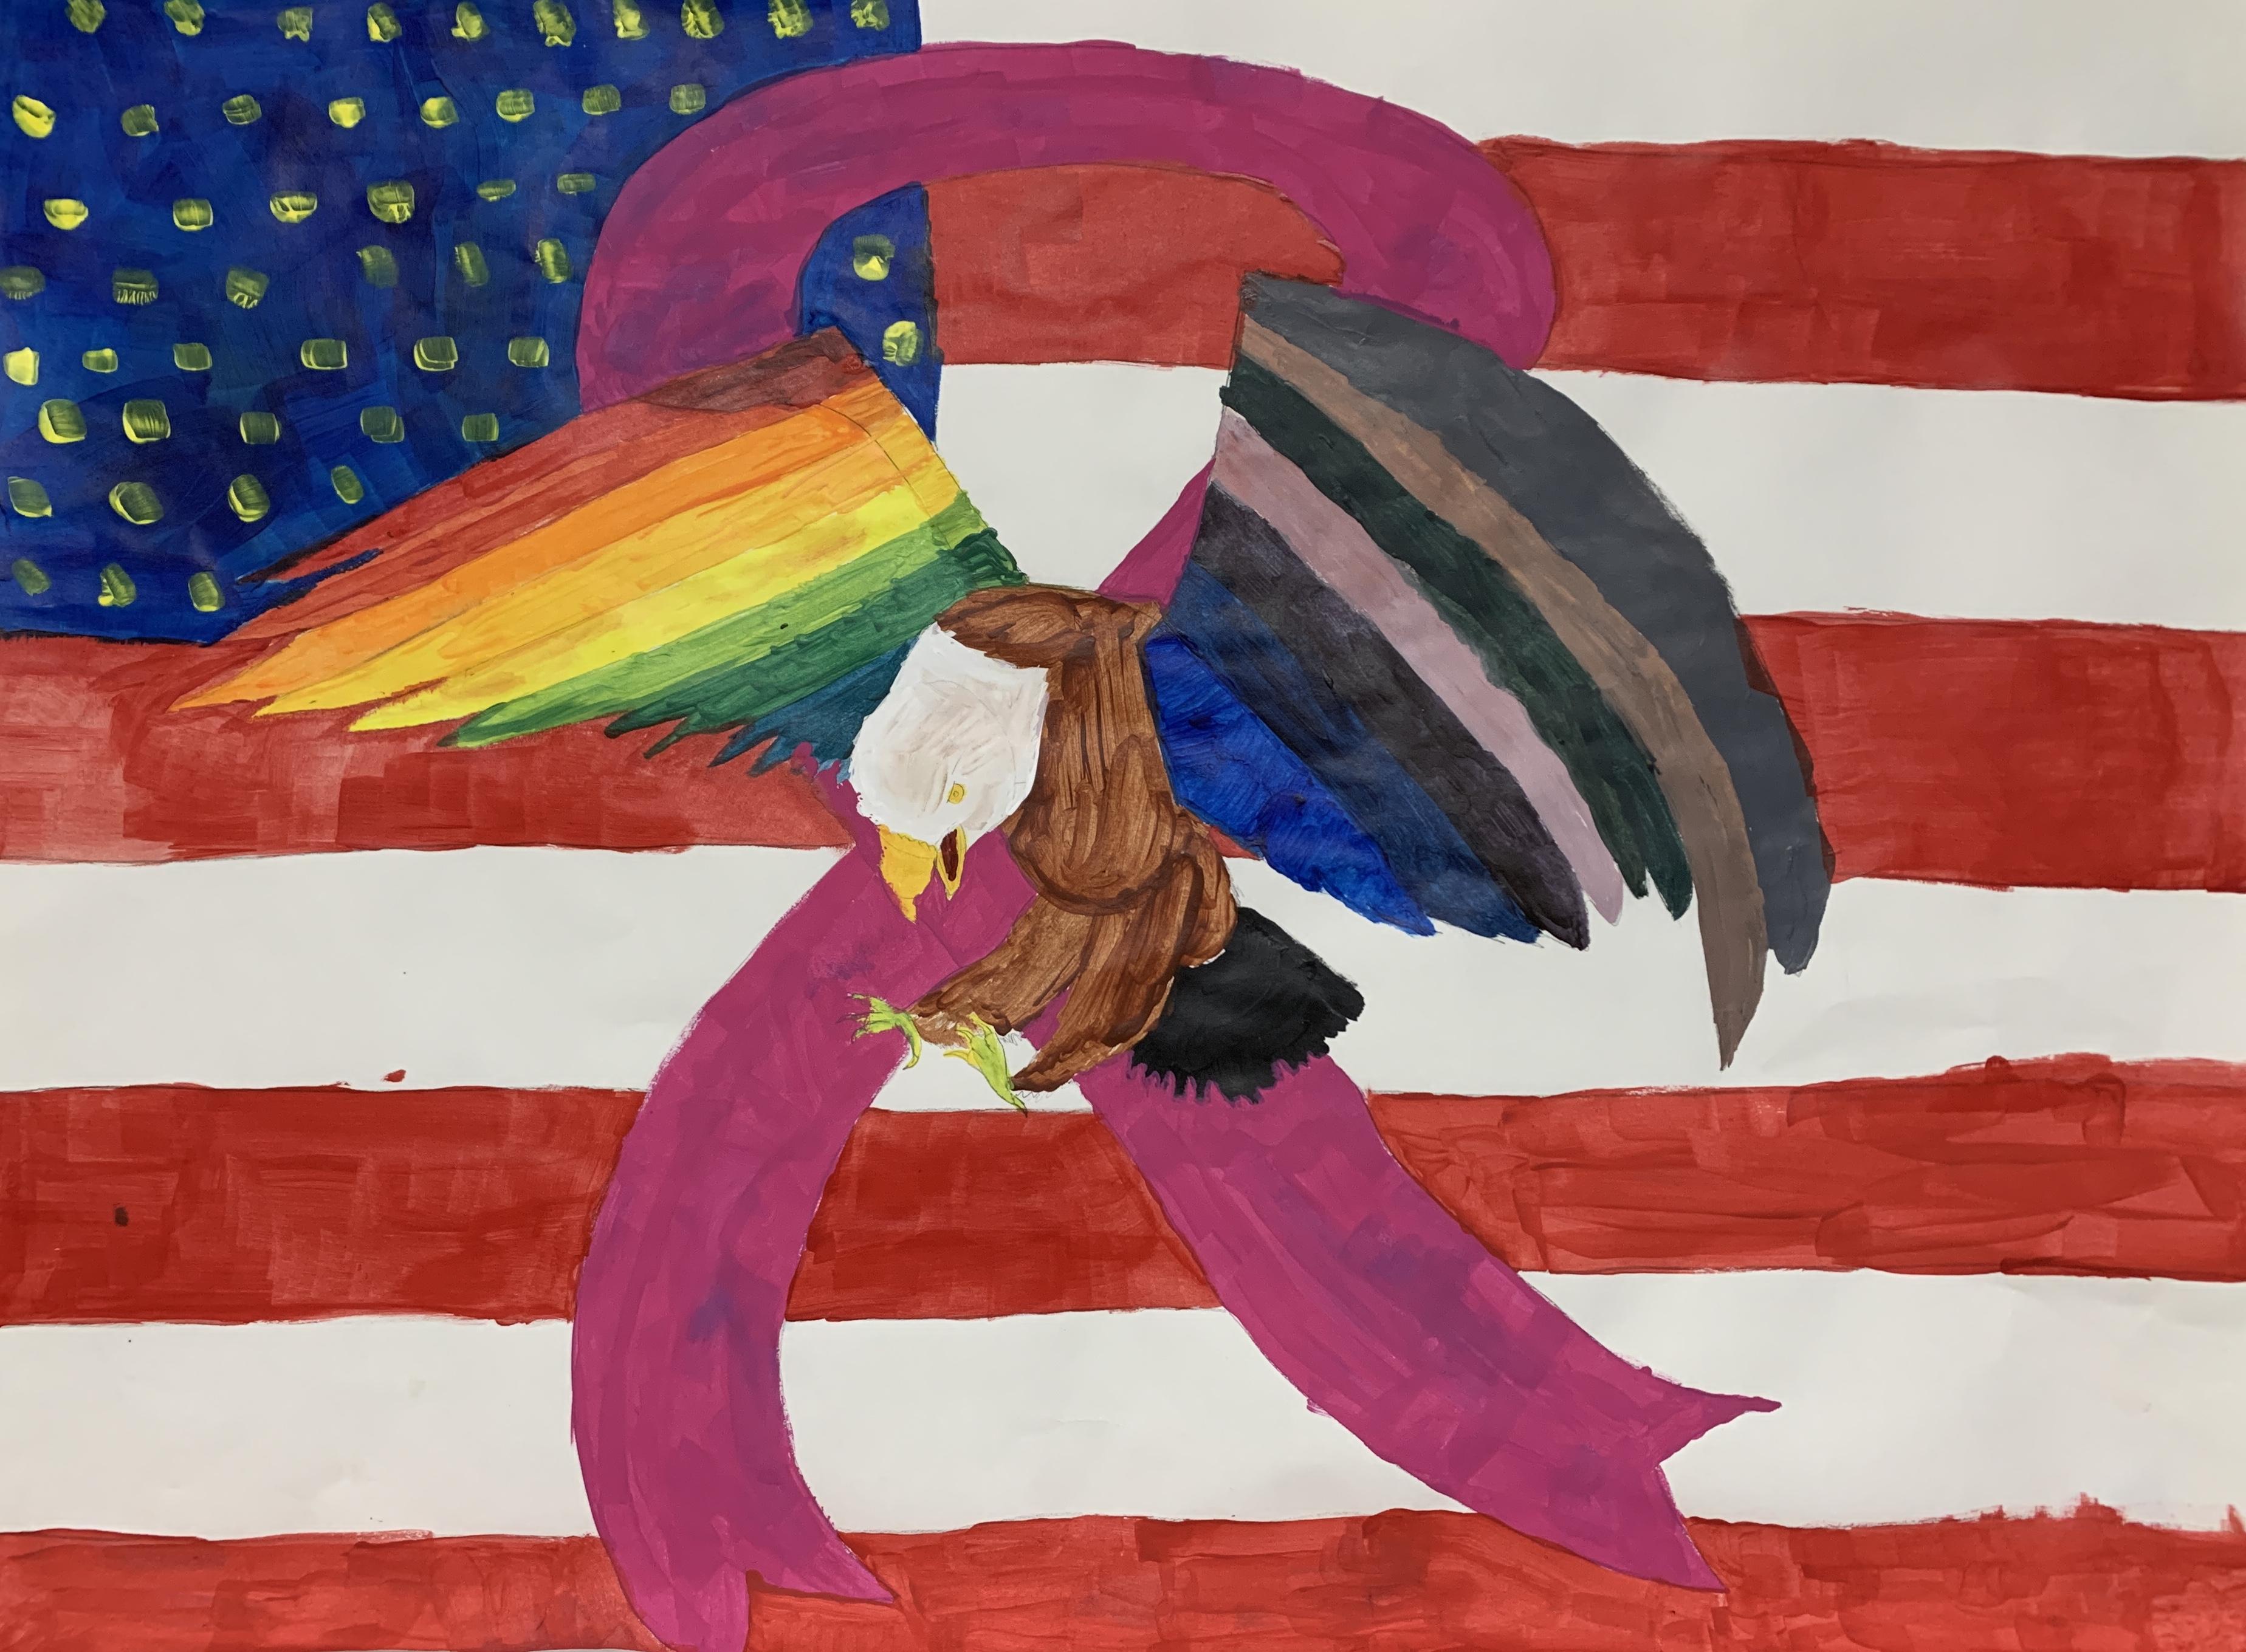 Students color wheel project - bald eagle